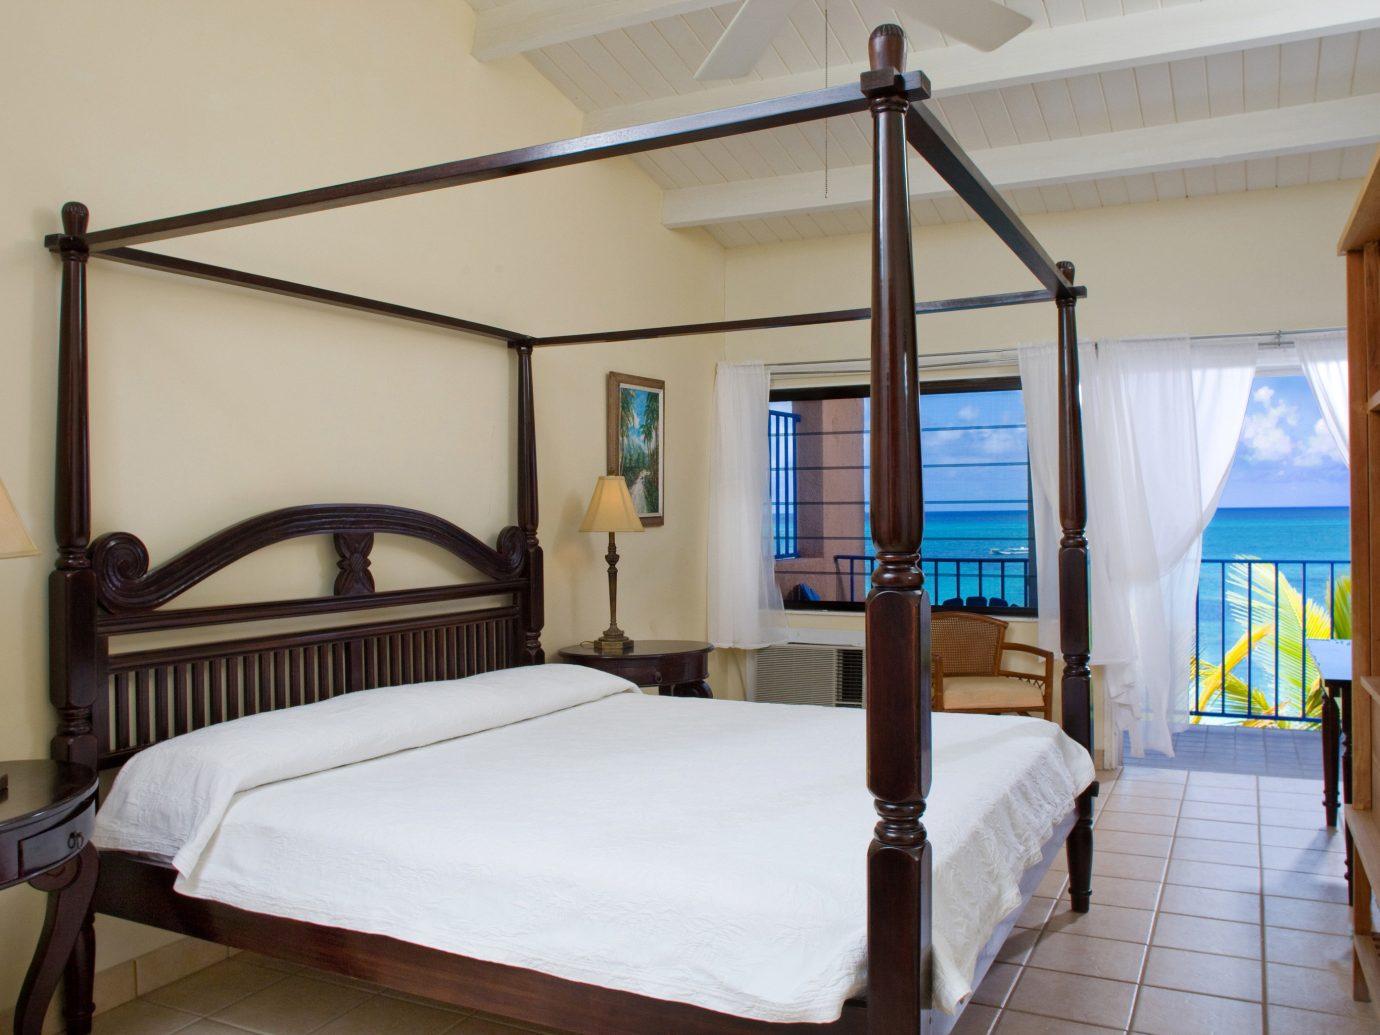 Hotels indoor wall bed floor room property Bedroom cottage Villa estate real estate Suite furniture Resort apartment